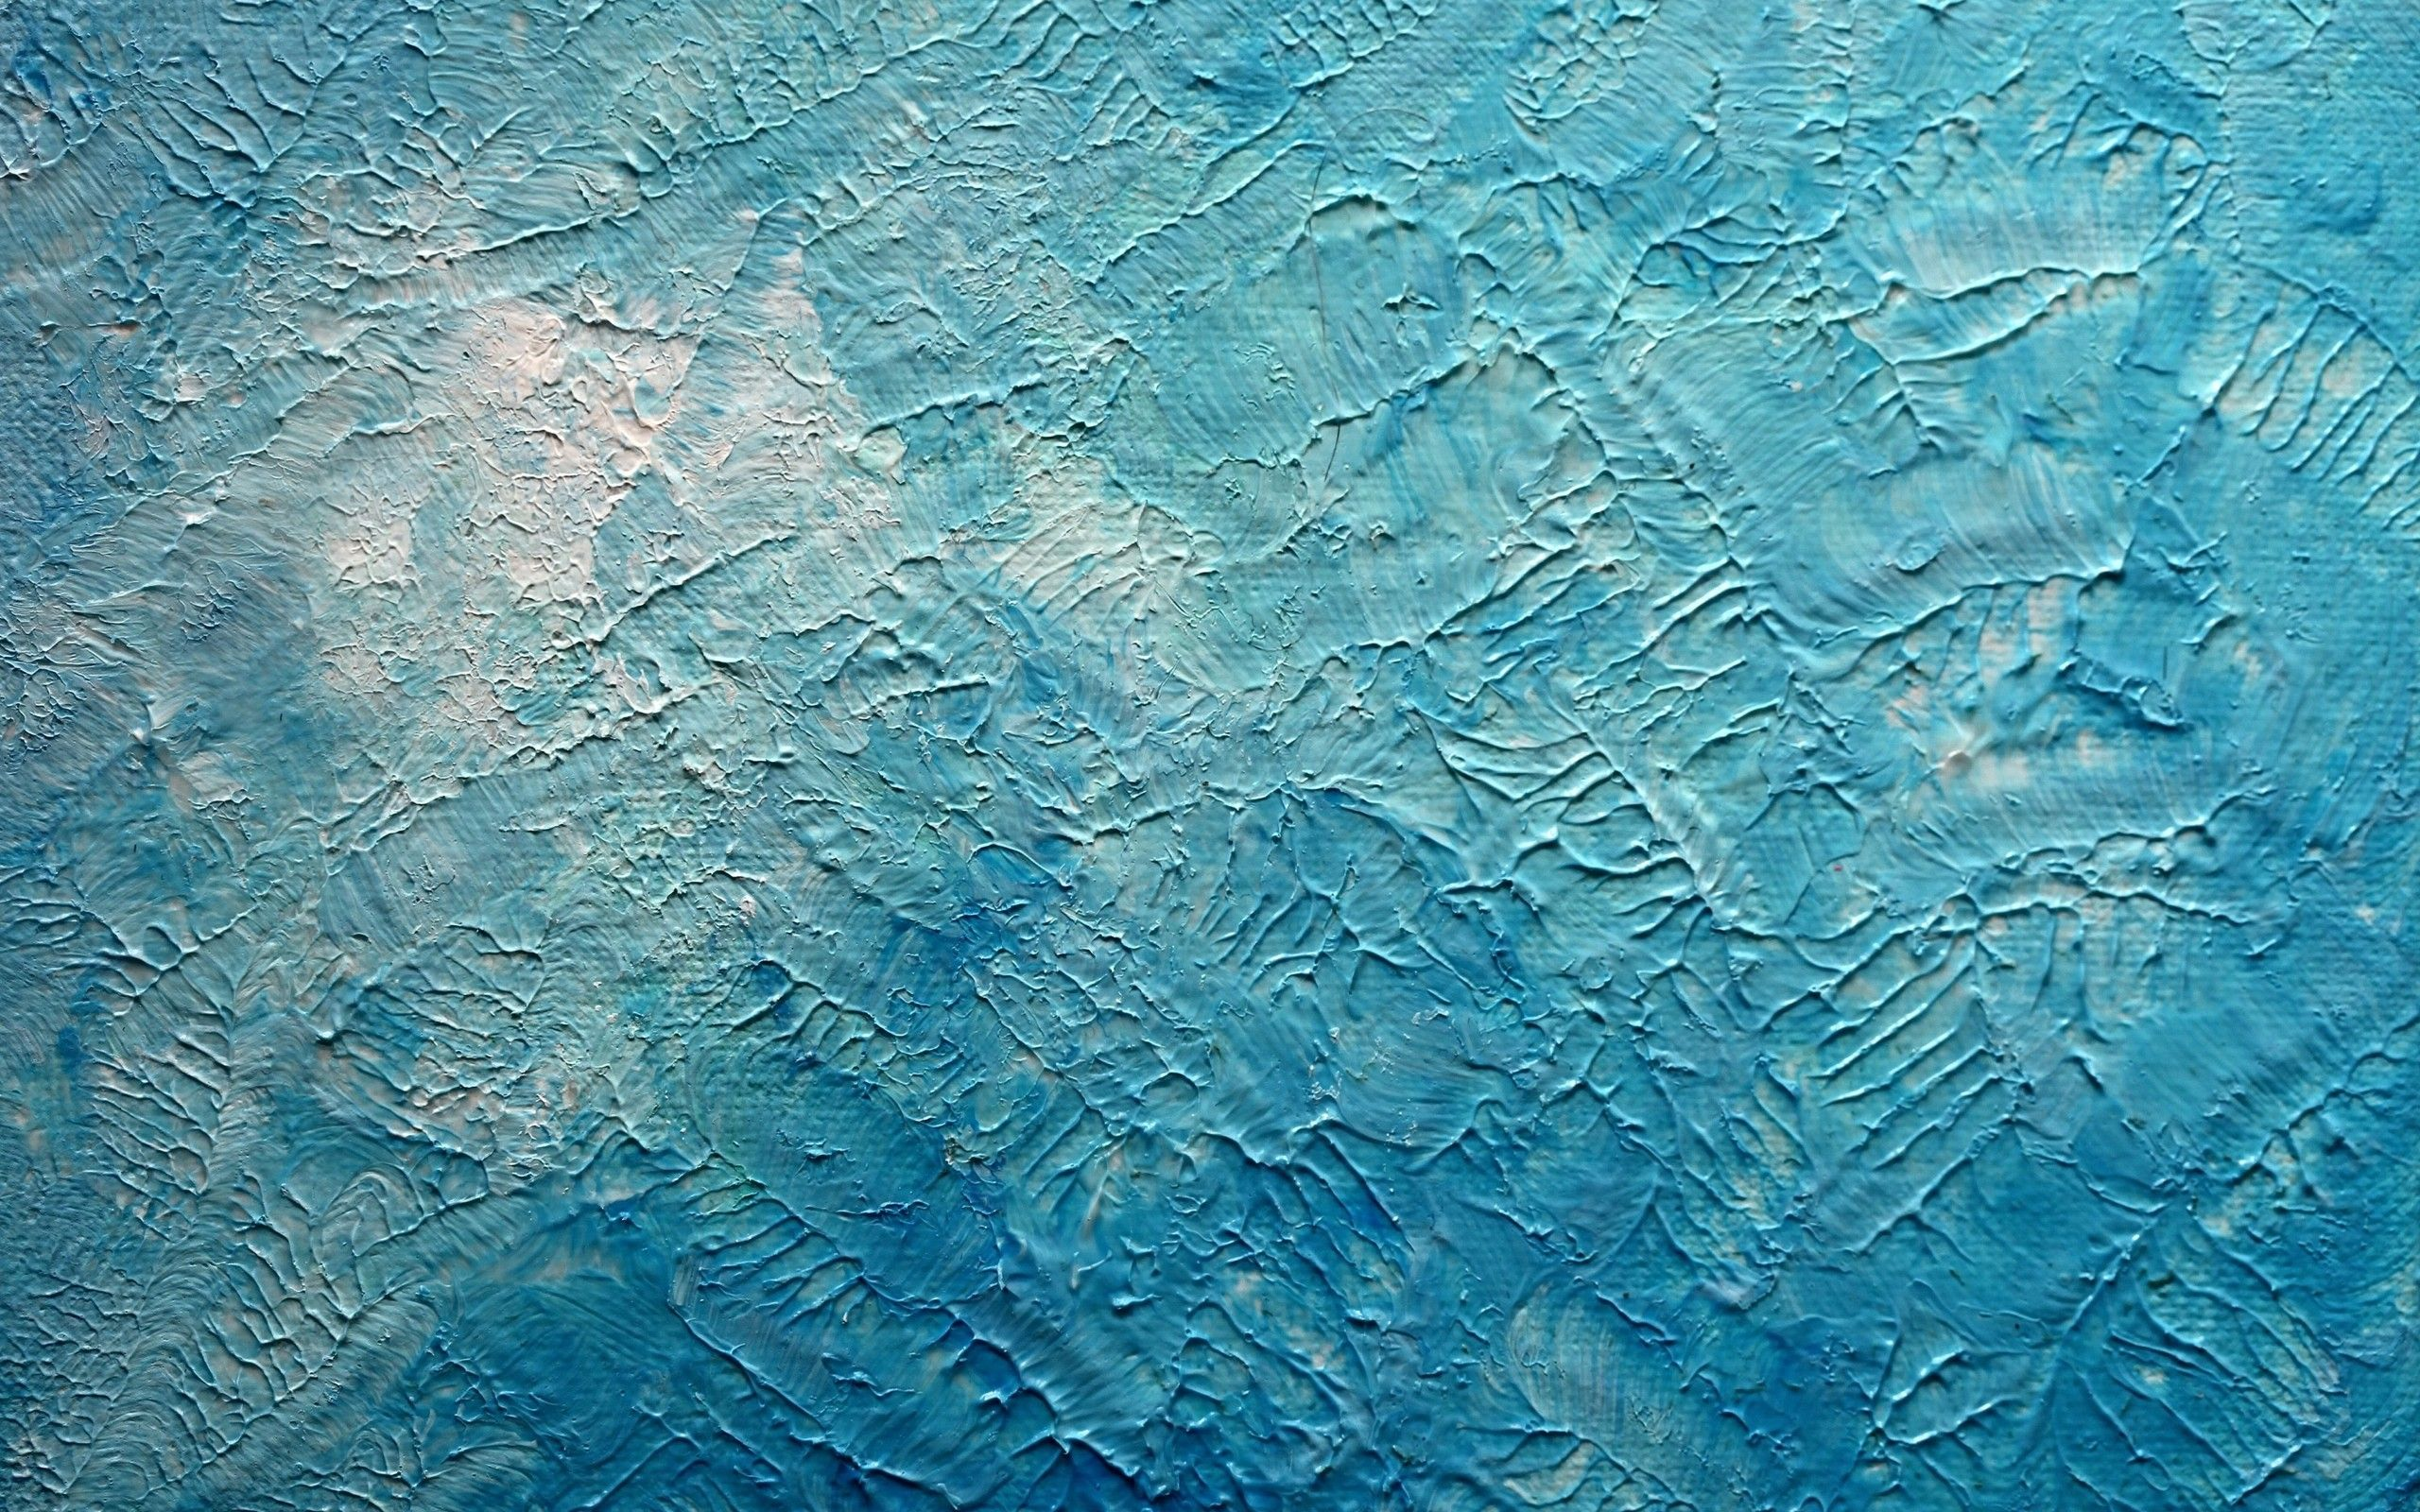 Blue Splash Texture Galaxy 2560 1600